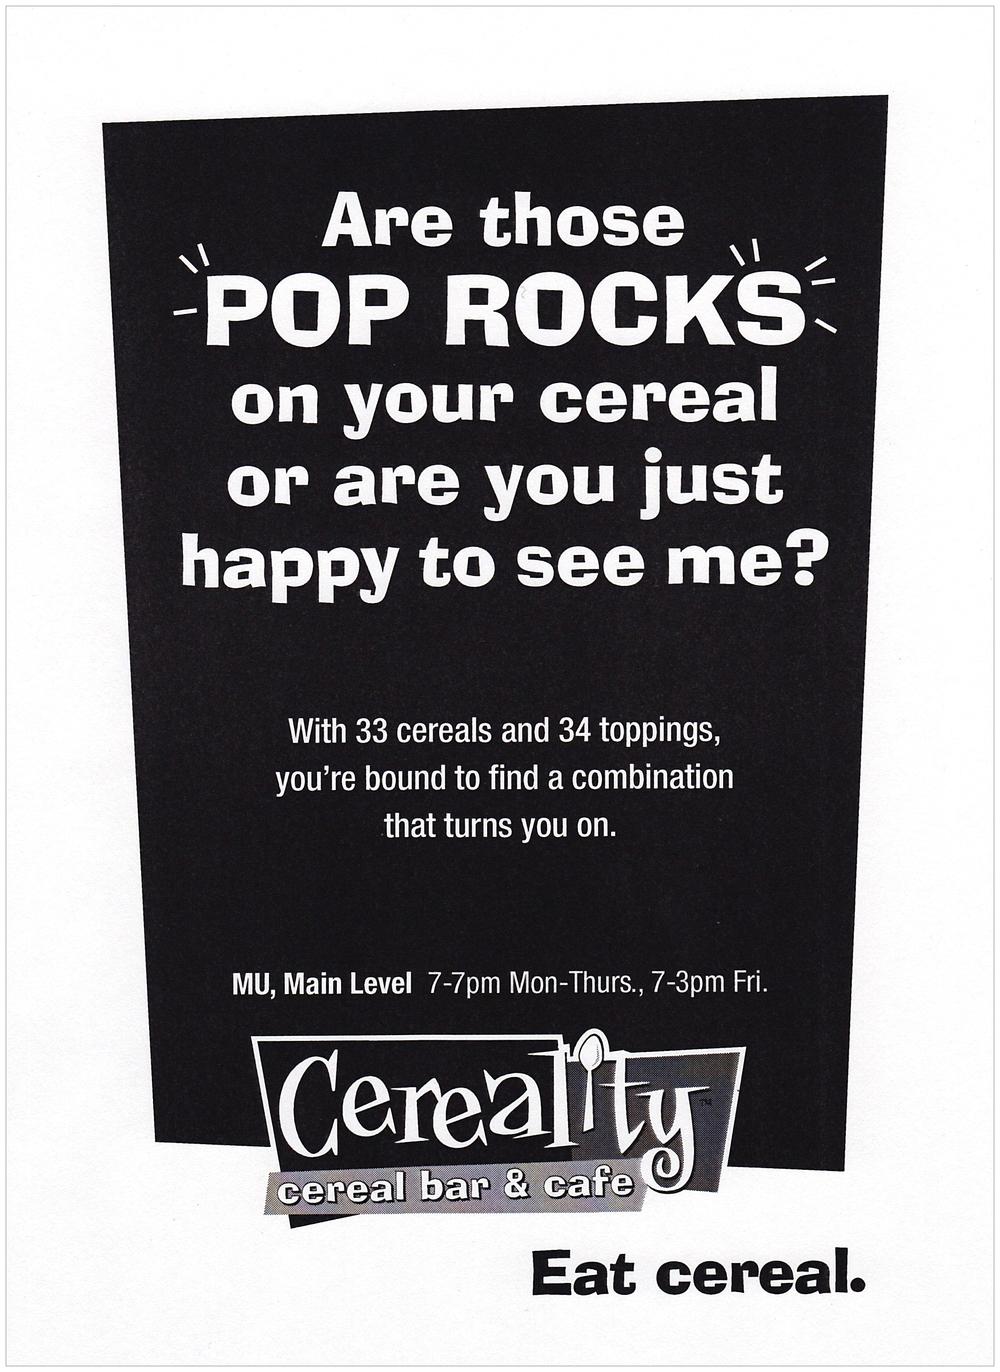 CerealityPopRocks.jpg